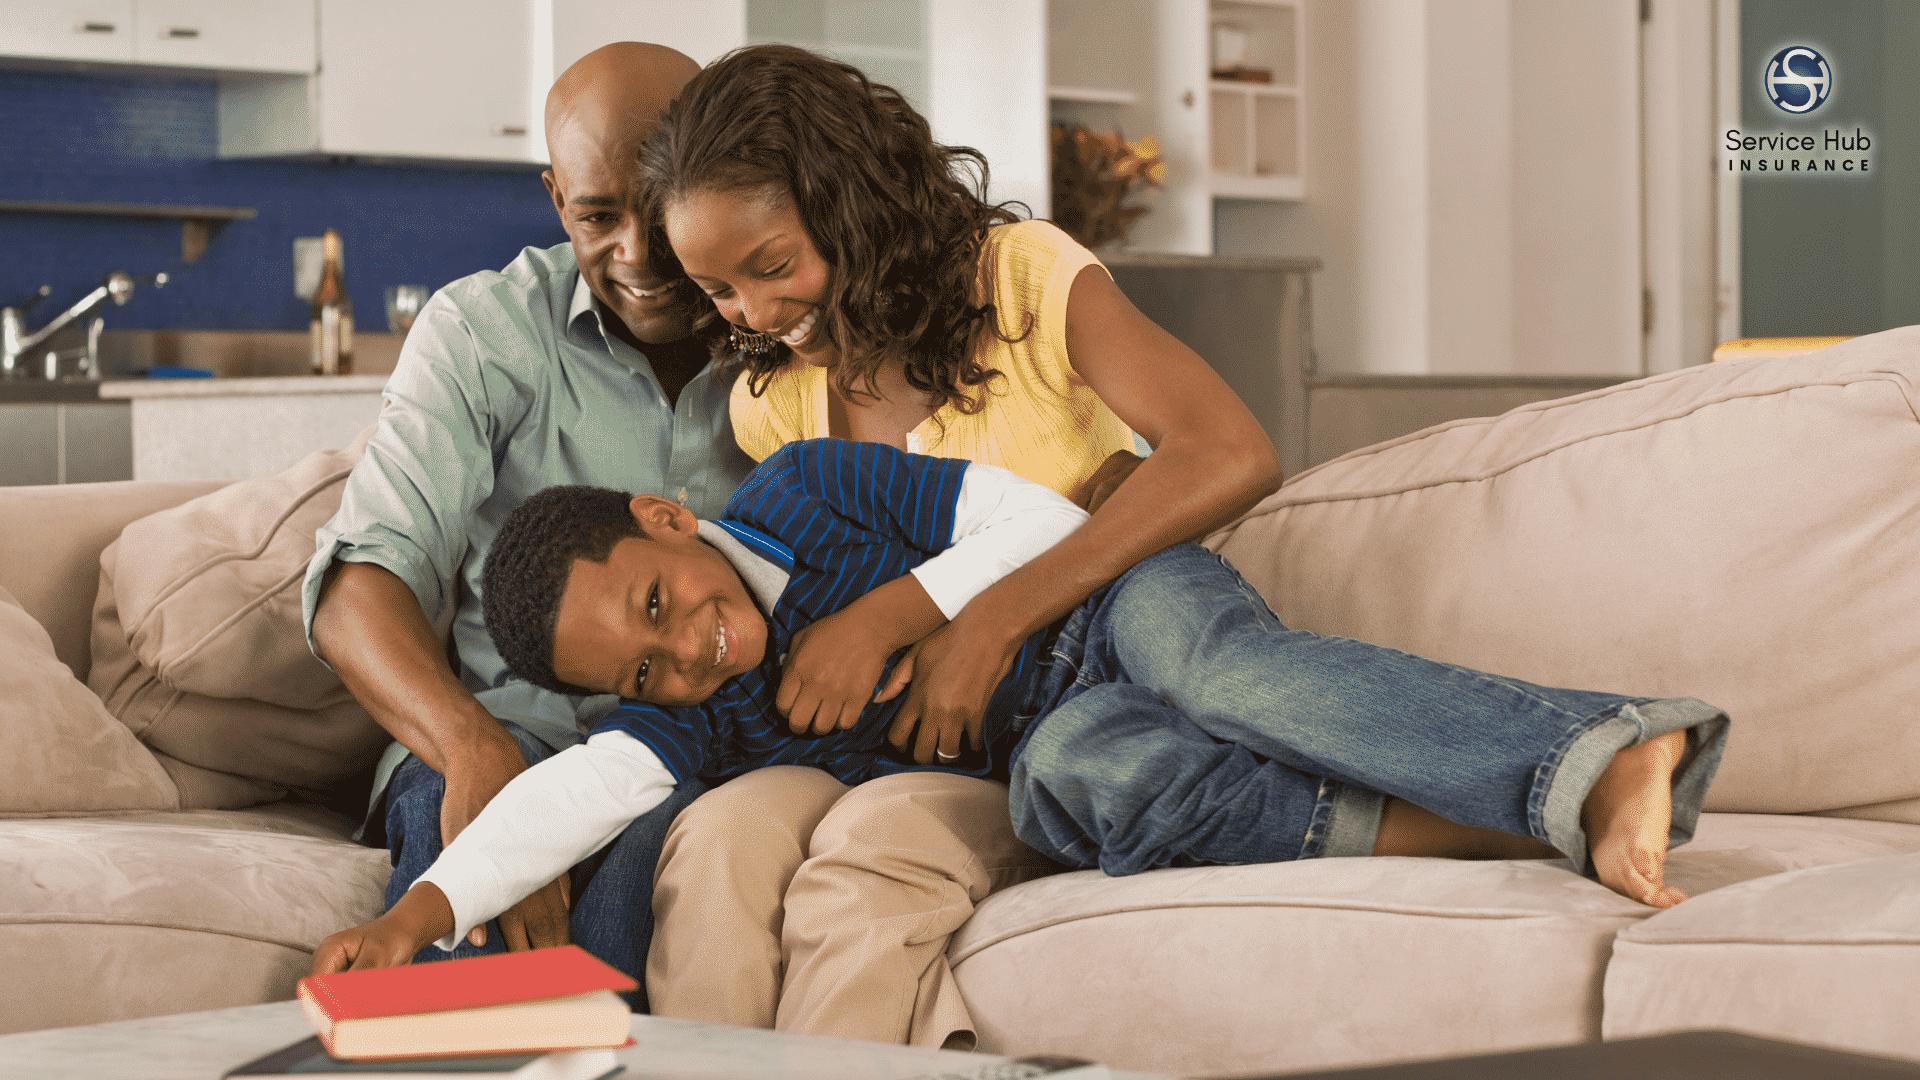 Homeowner Insurance -  Service Hub Insurance